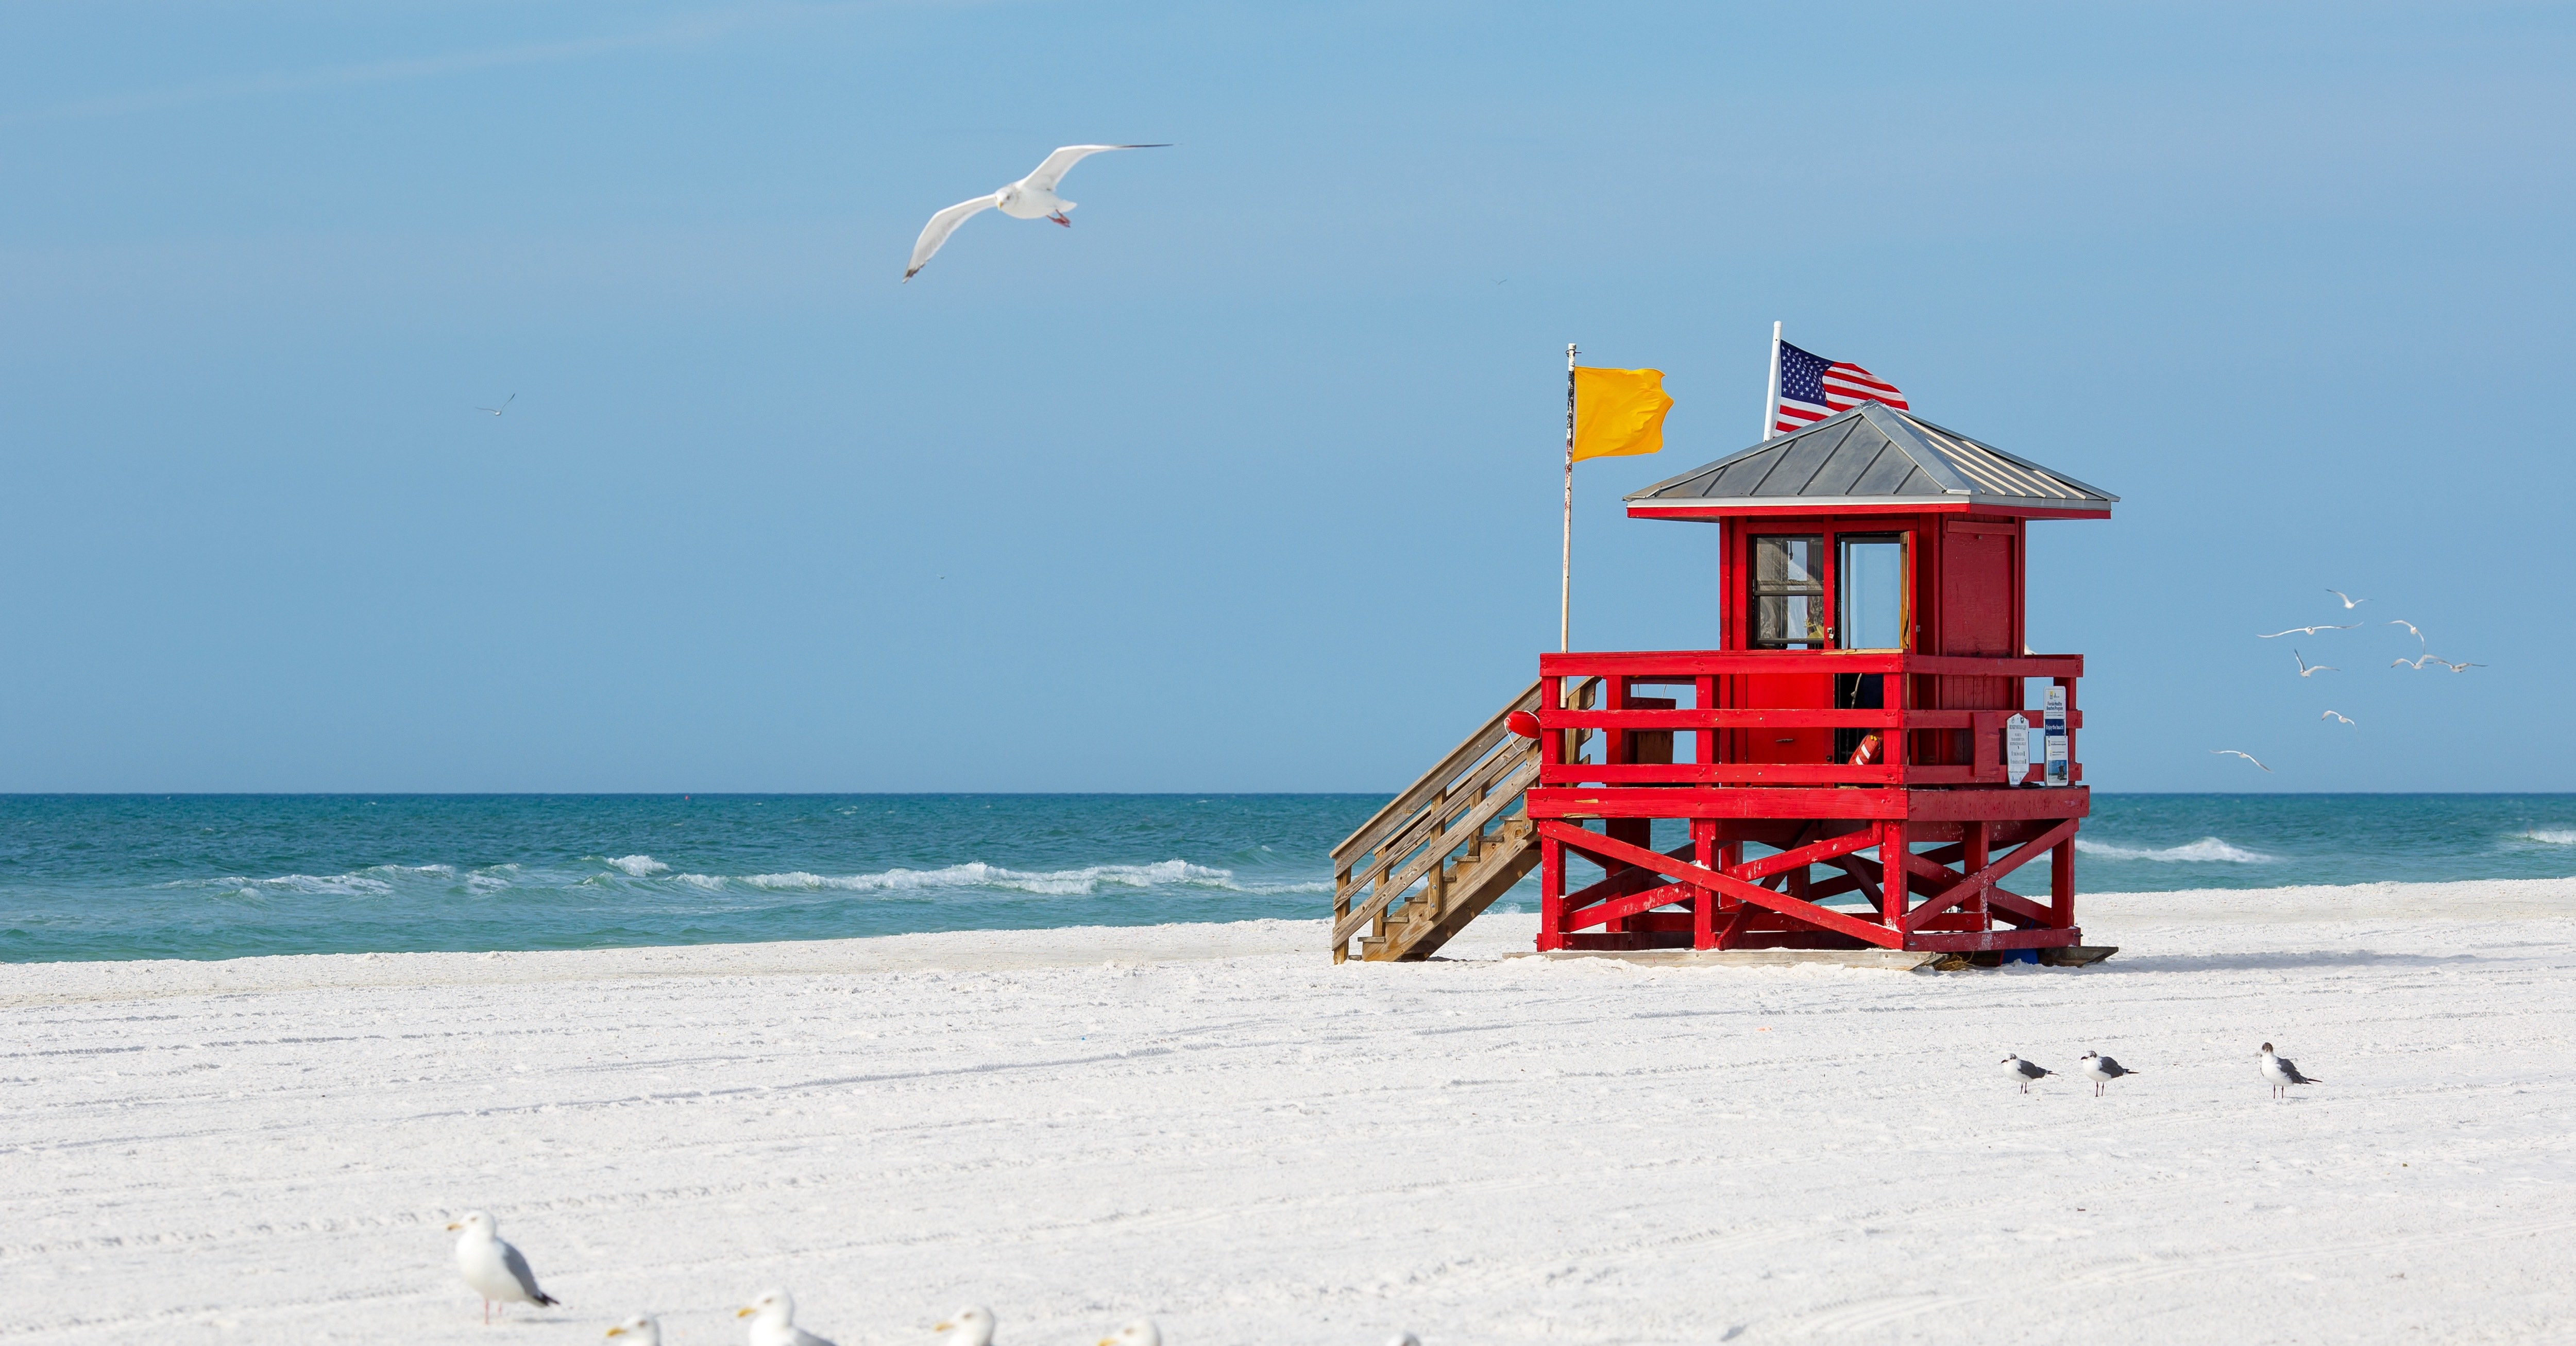 Siesta Key Beach Expert - Cheri Guentner - RE/MAX Platinum Realty image 2